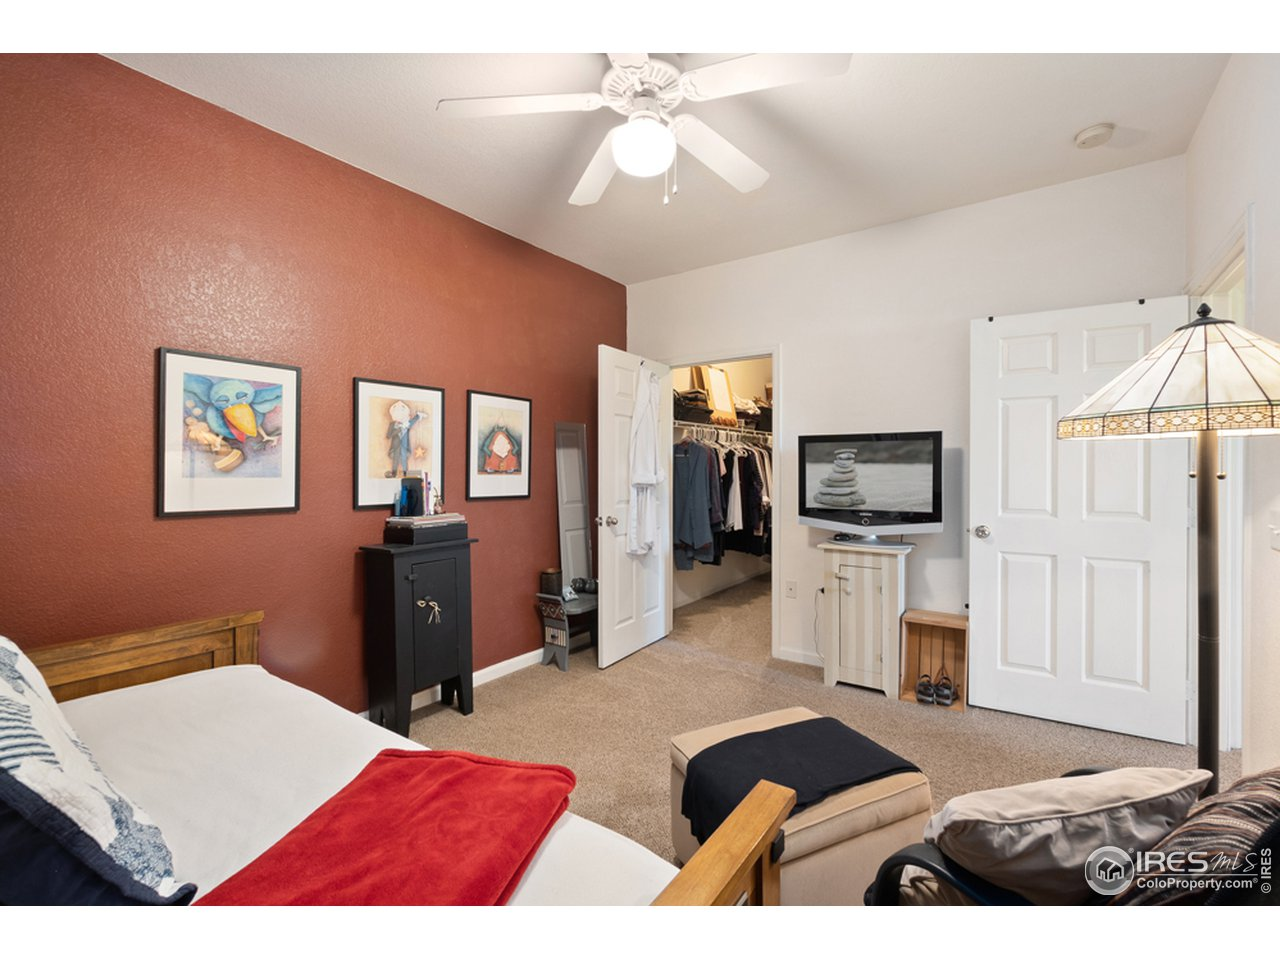 Bedroom/large walk-in closet.